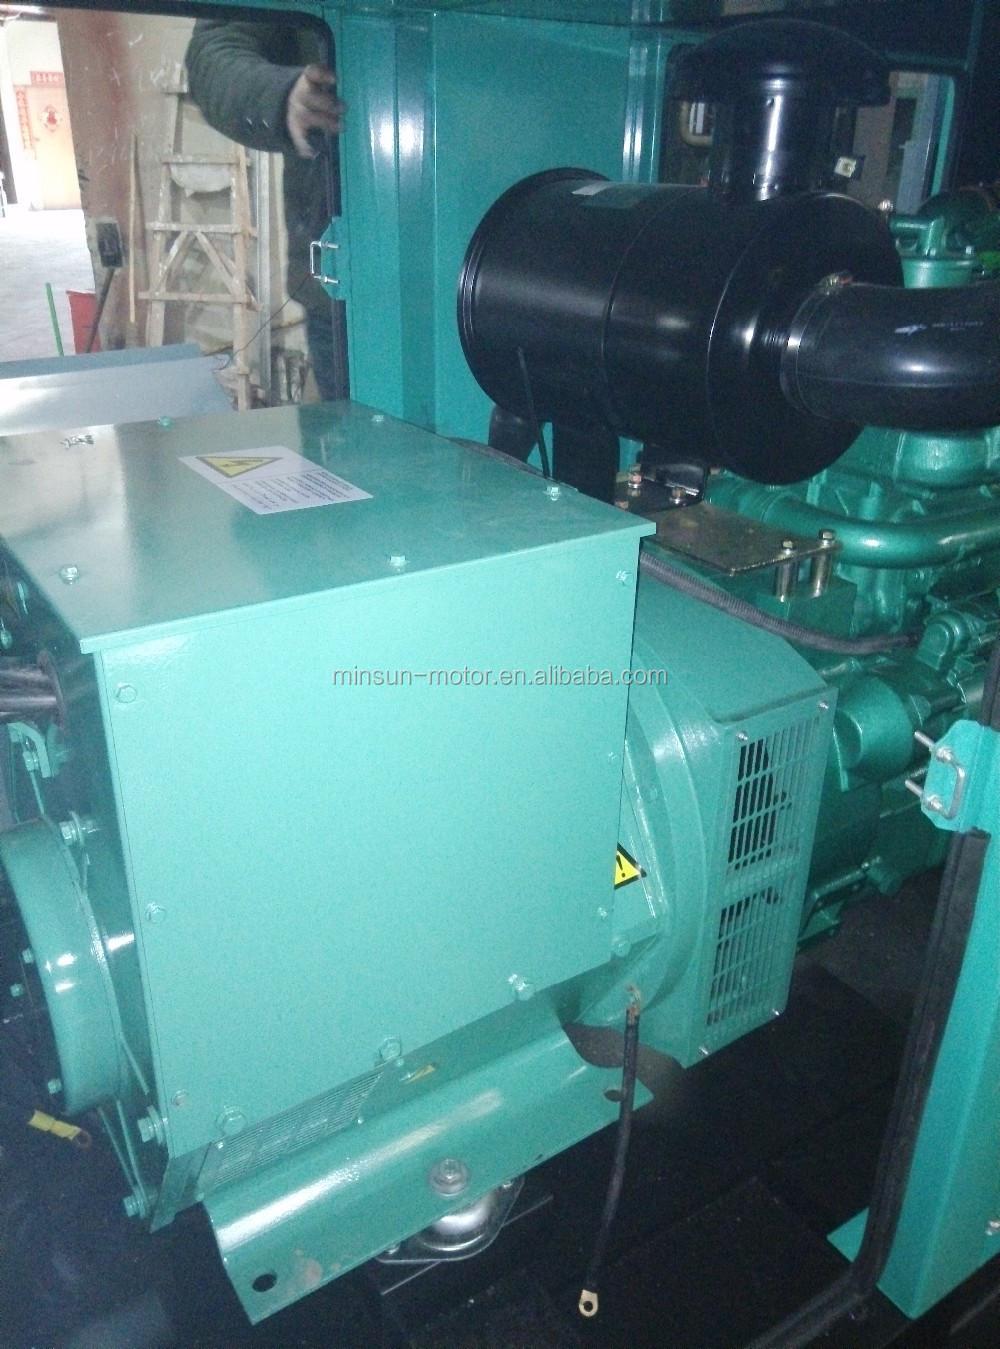 China Yuchai Geruscharm Aggregat 250kva Diesel Generator Preis Transfer Switch Wiringautomatic Suyang Atsautomatic Wir Verwenden Marke Auomatic